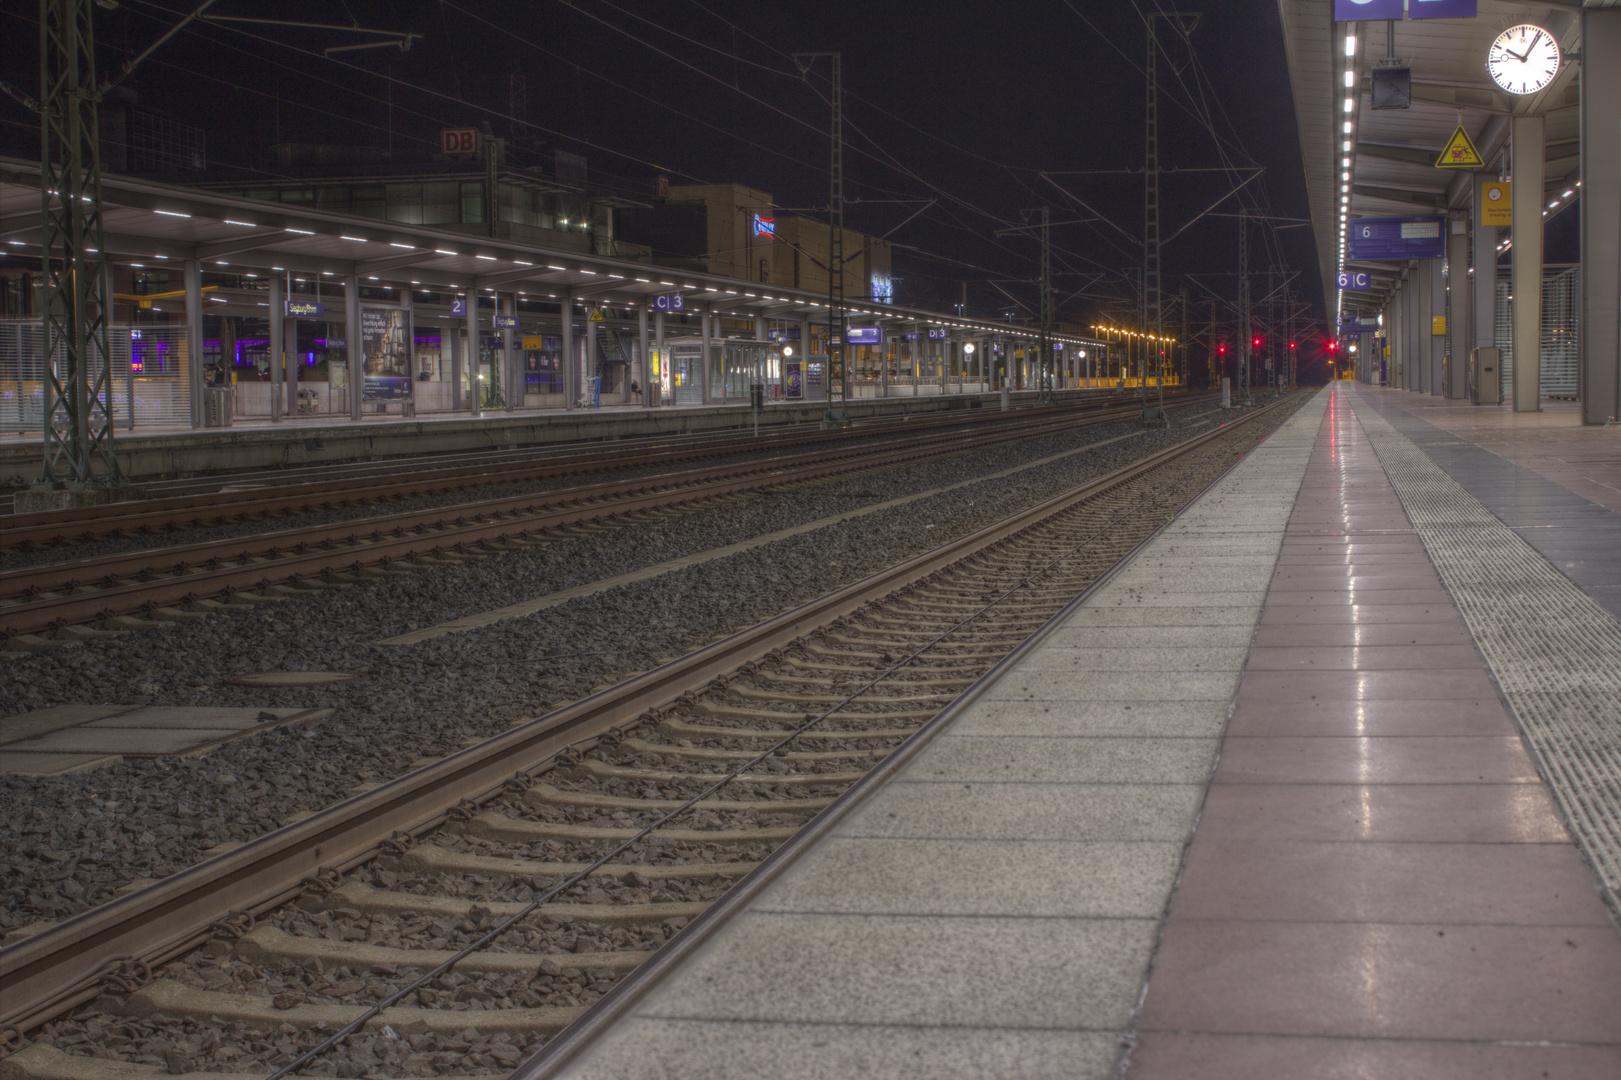 Siegburger Bahnhof